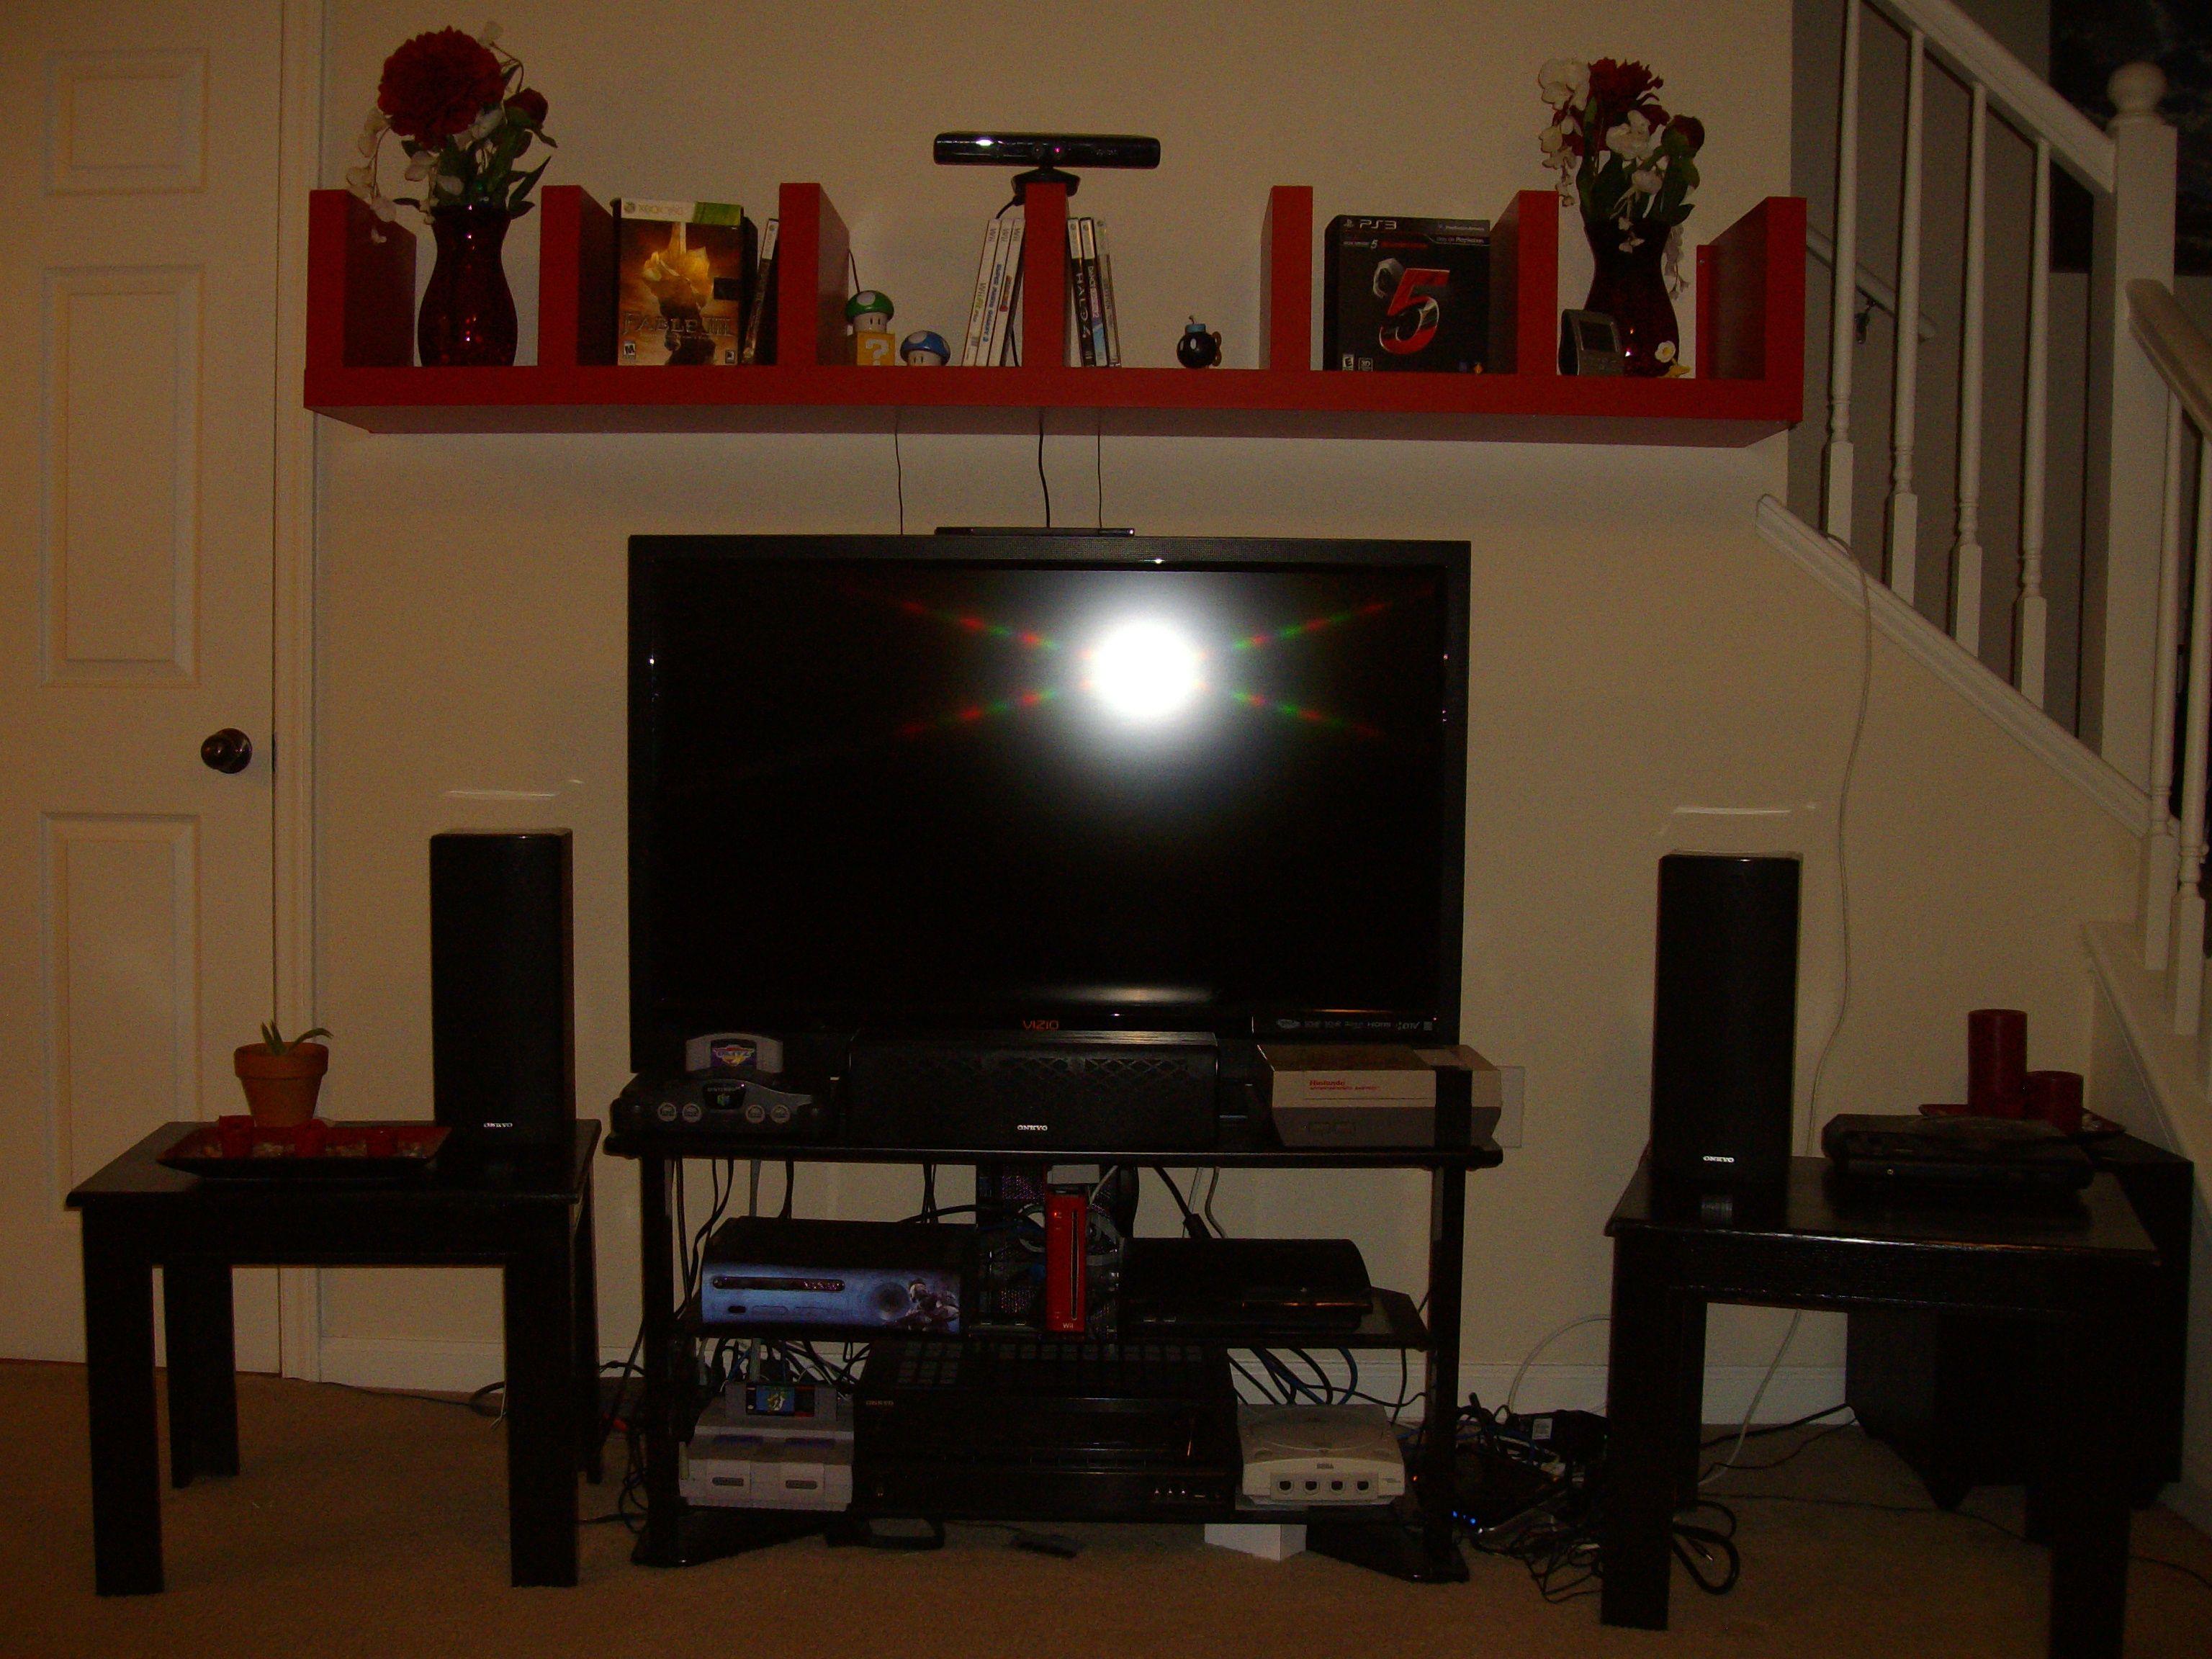 Ikea LACK Wall Shelf Unit Designs2Go Black Glass and Wood TV Stand